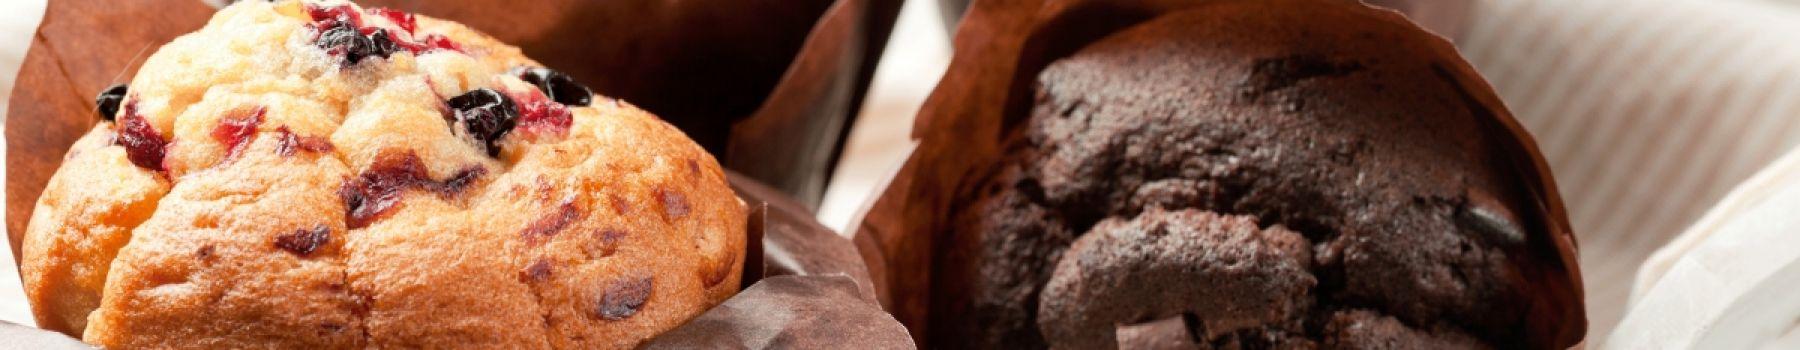 Przepisy na muffiny